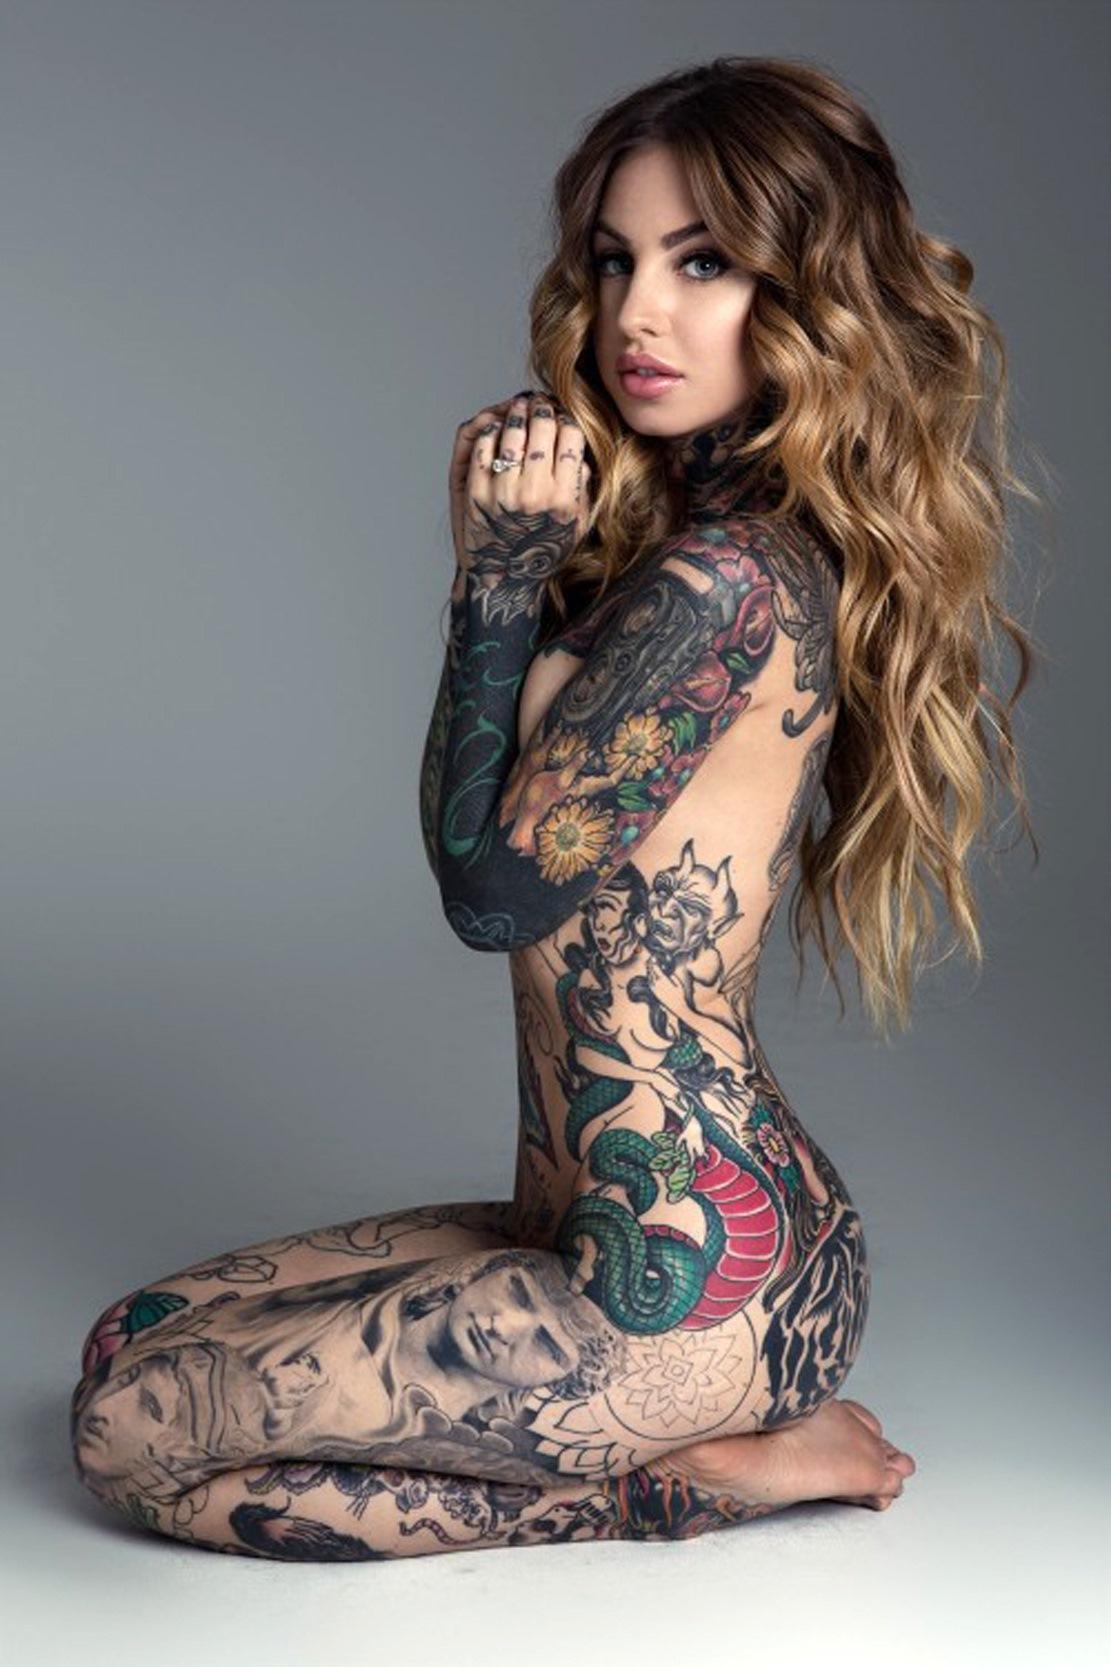 Sexy naked girl tattoo bike lady